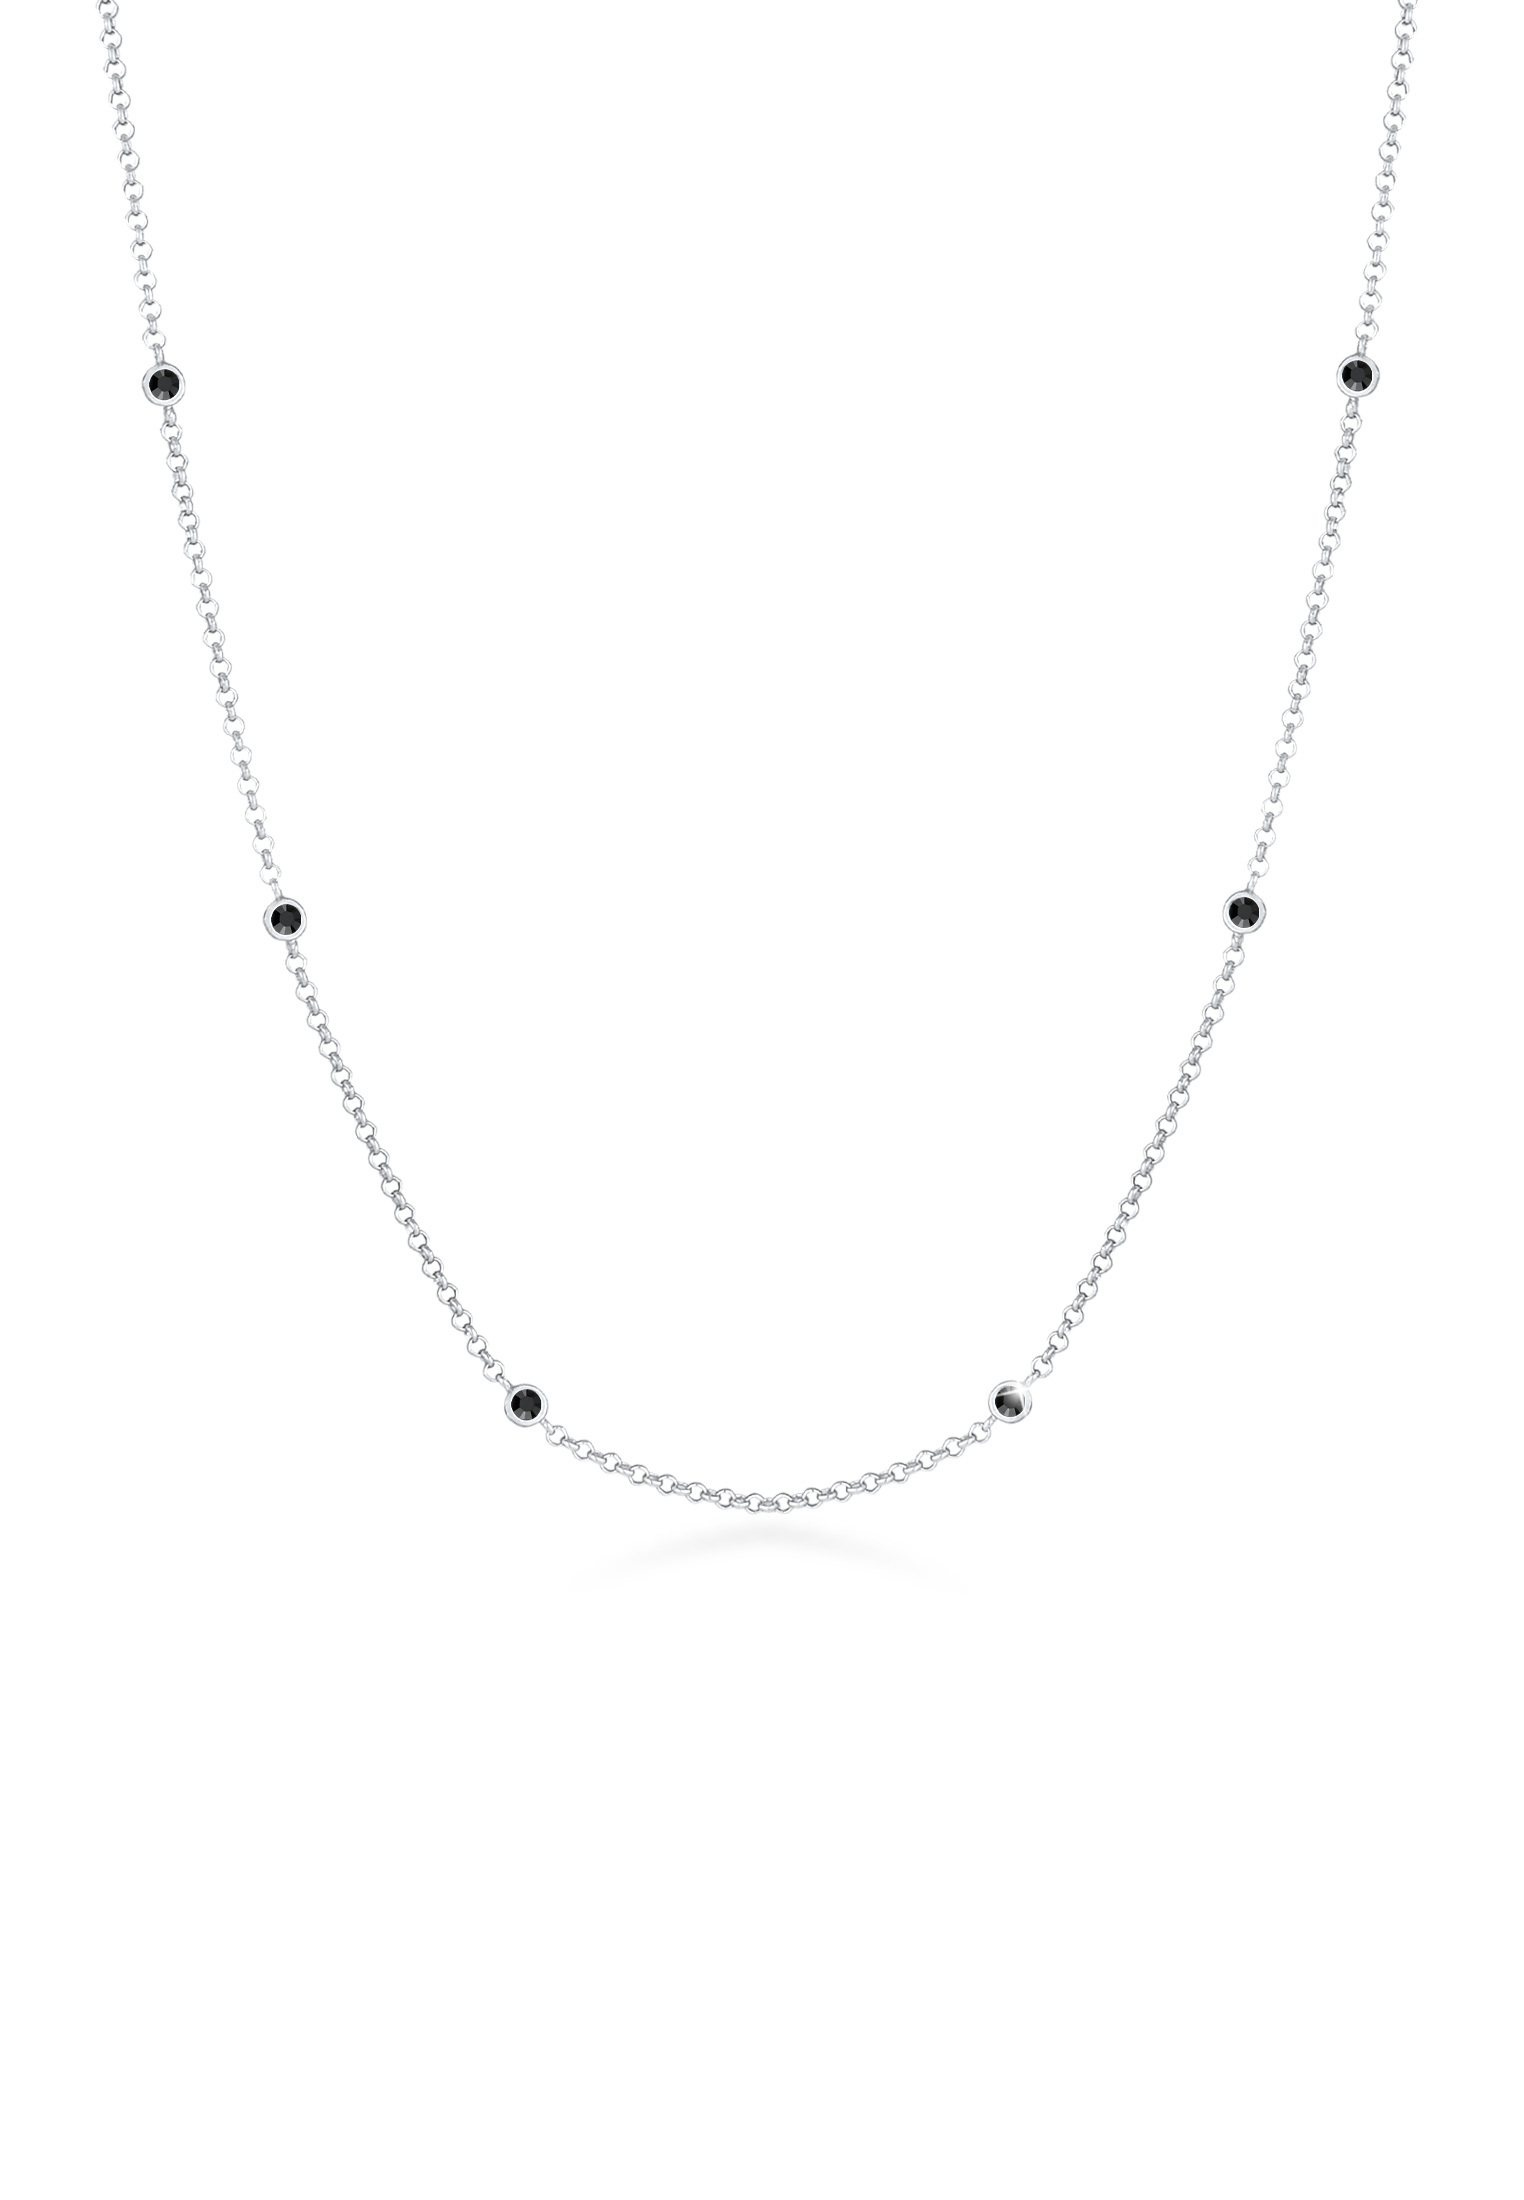 Halskette | Kristall ( Schwarz ) | 925er Sterling Silber